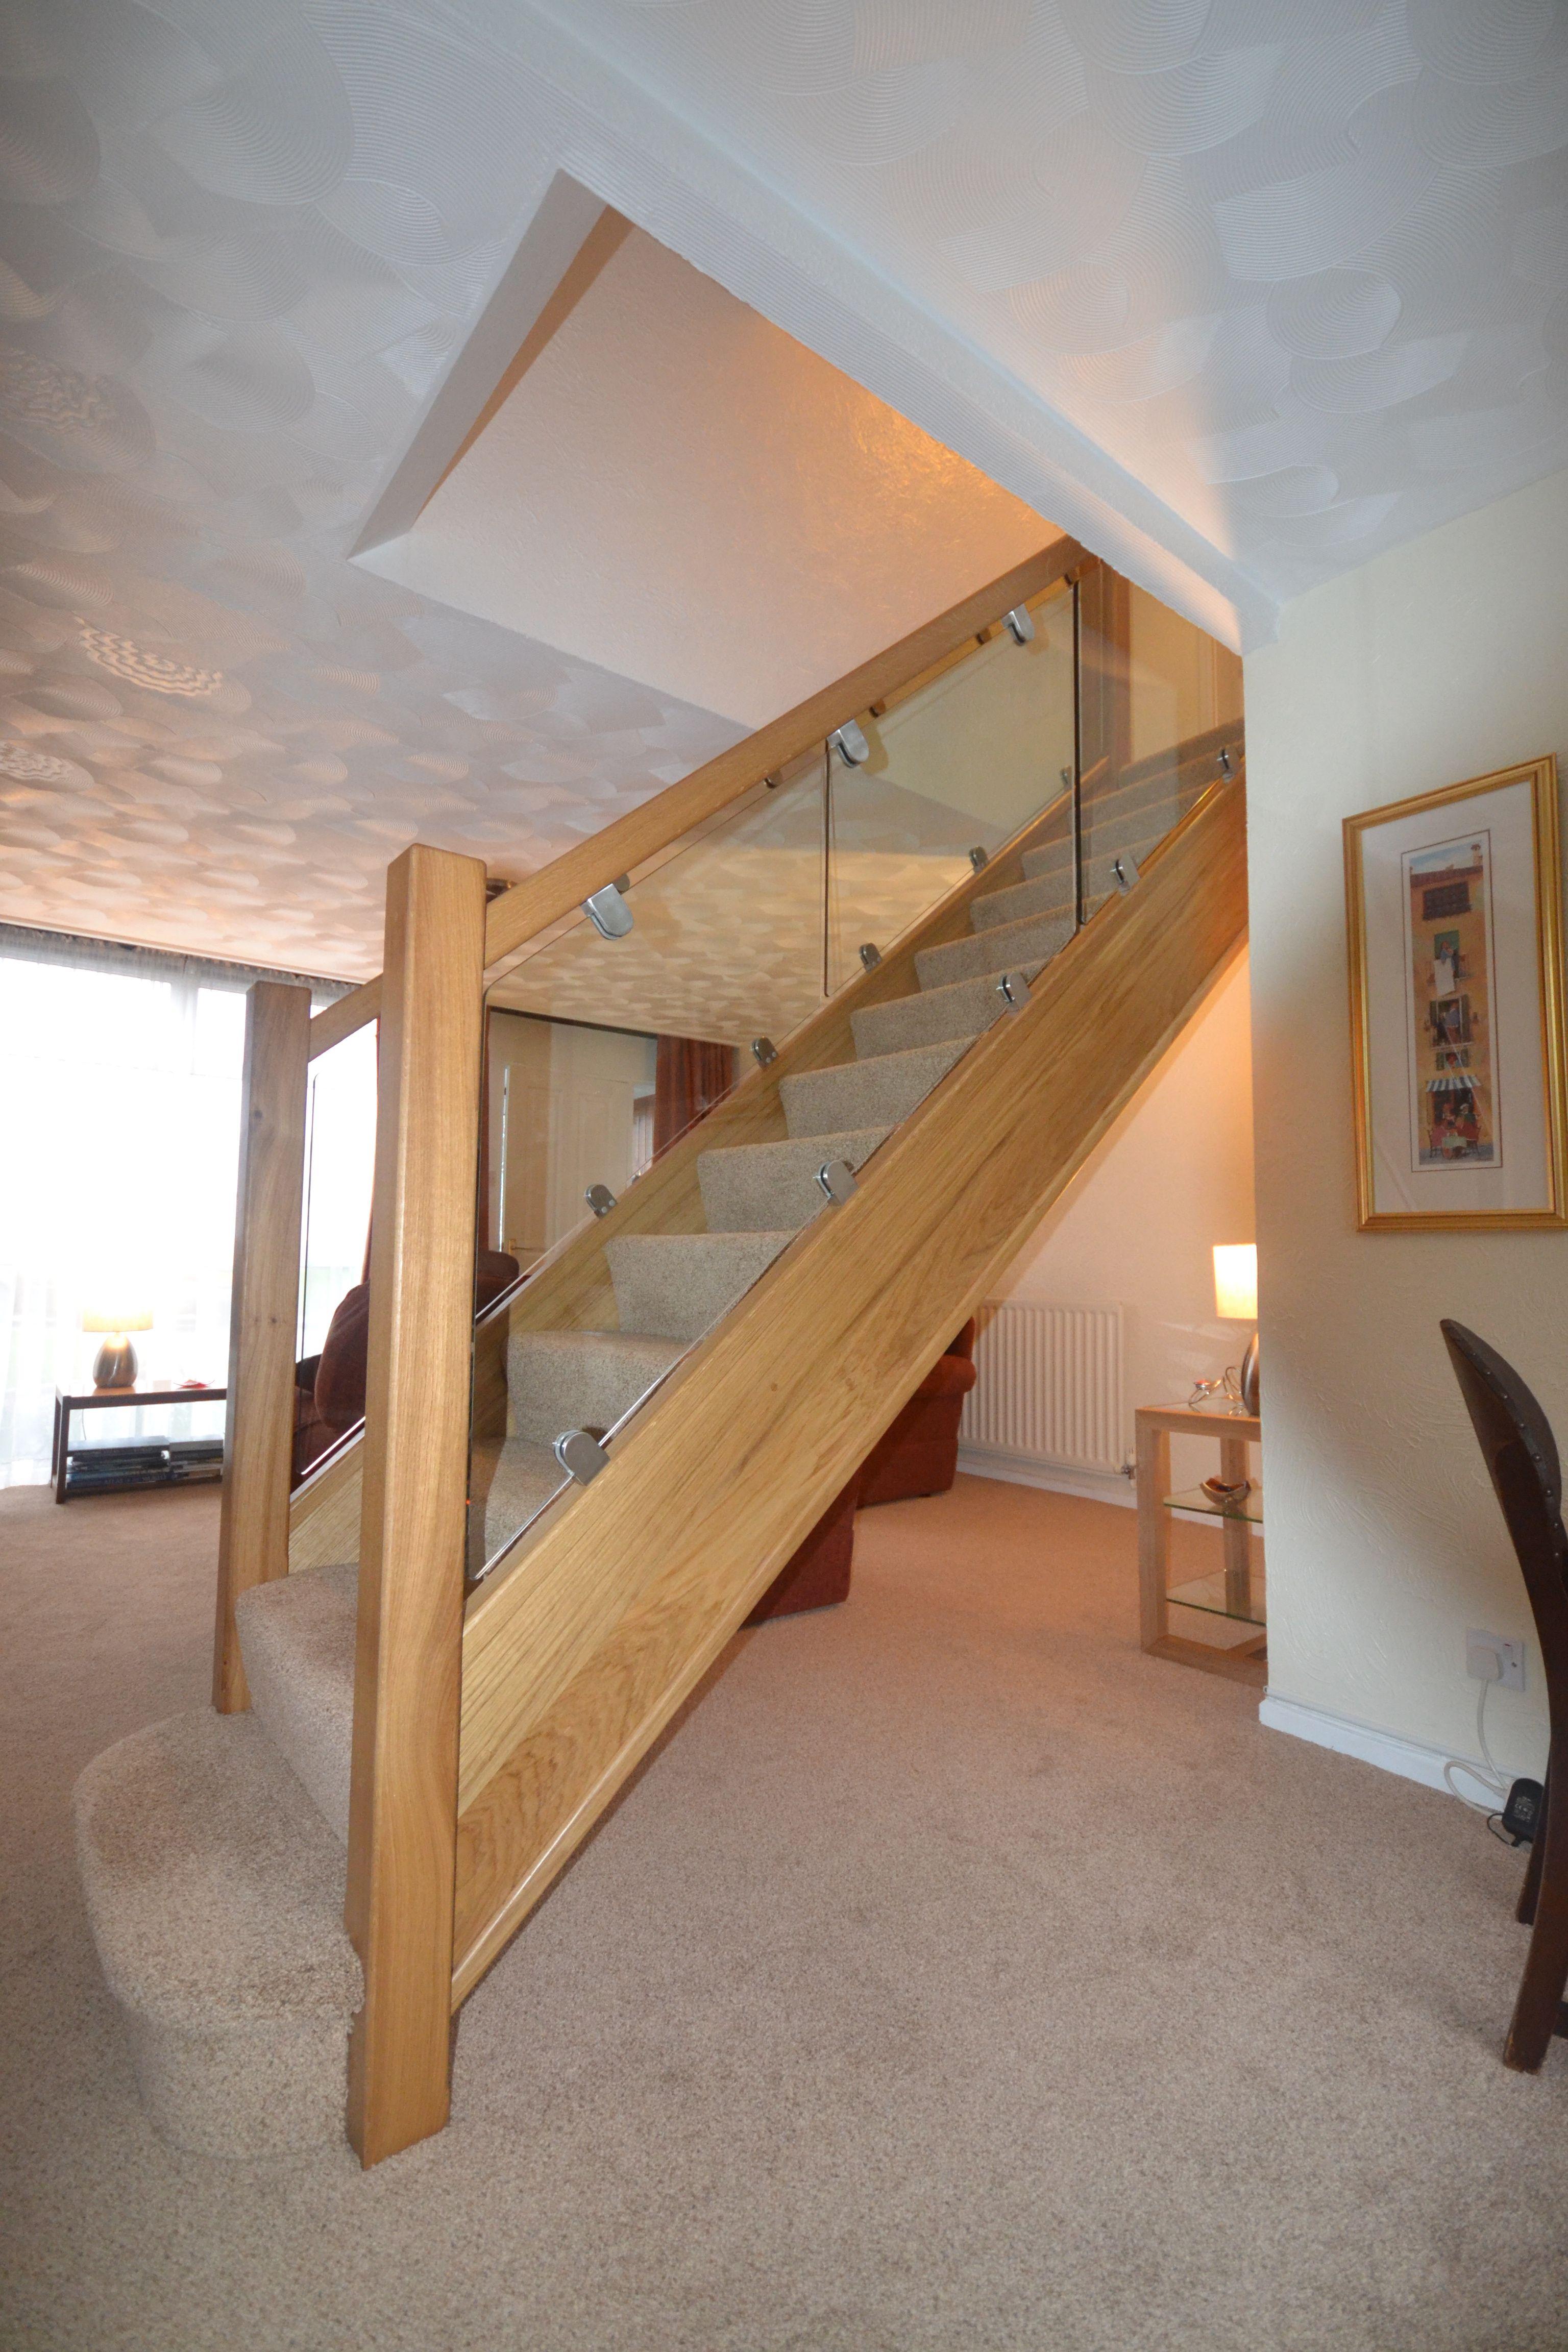 Gable end window ideas  bespoke oak staircase  light shade of oak to keep the space nice